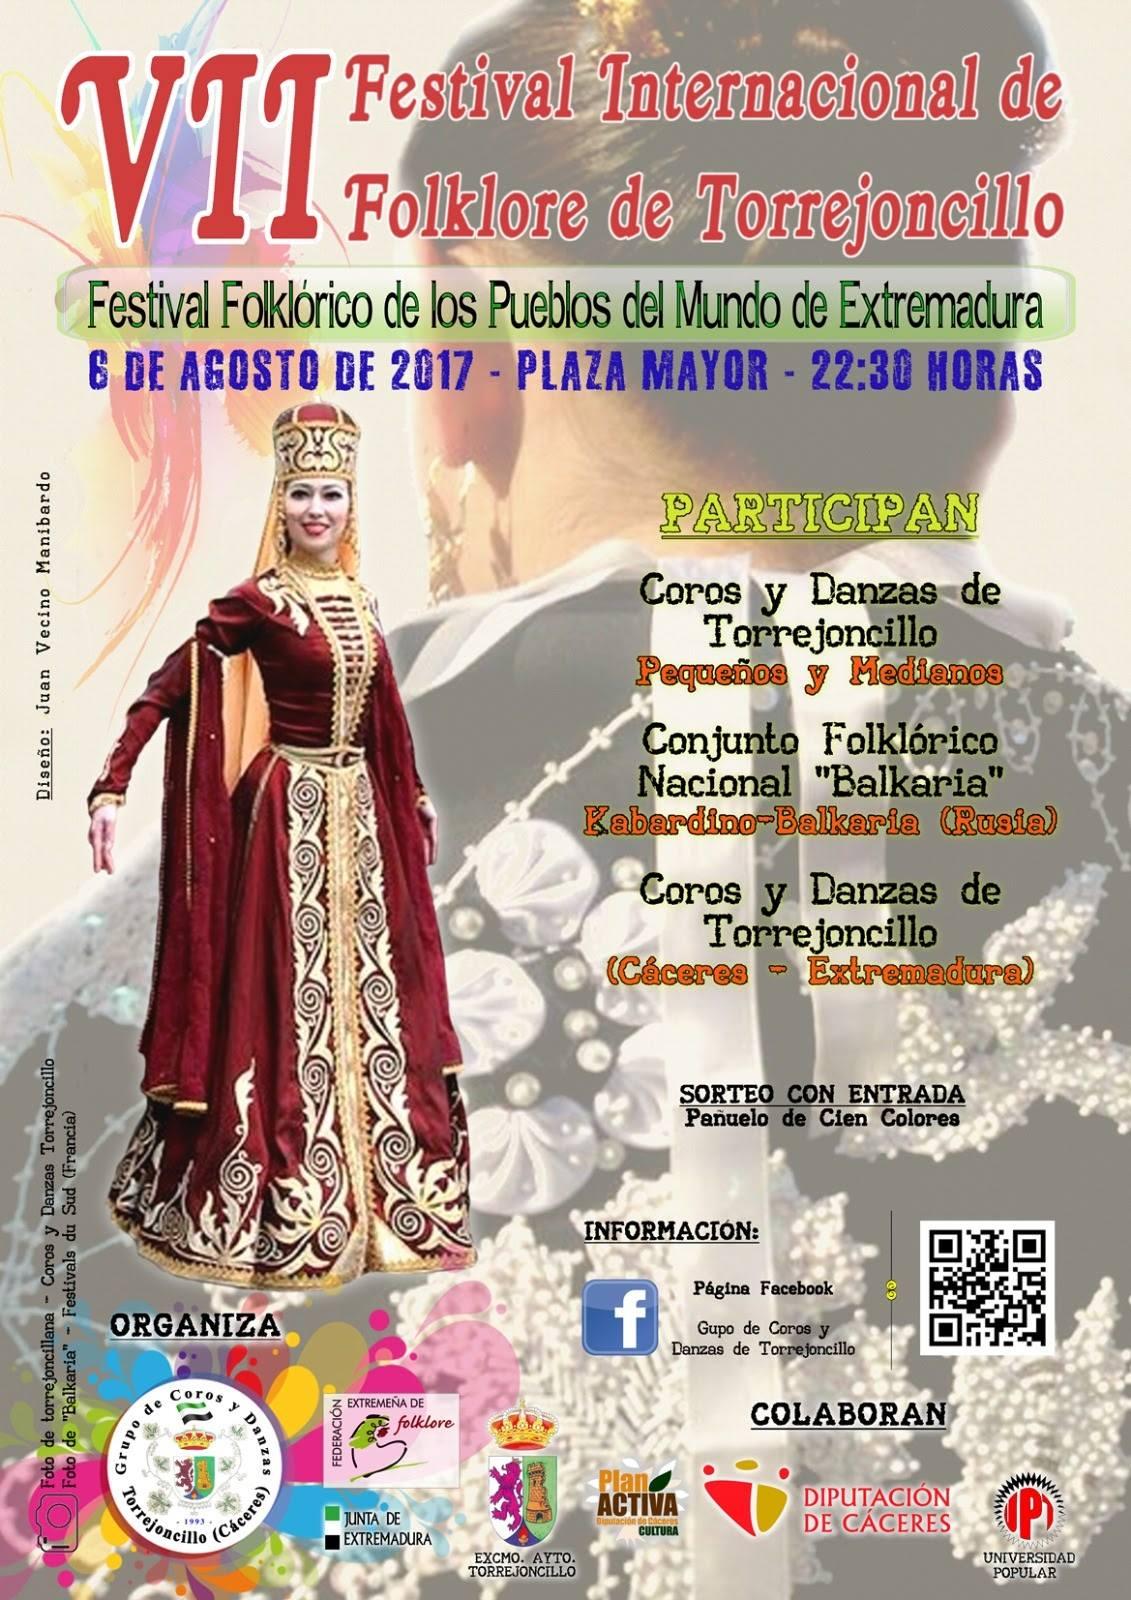 VII Festival Internacional de Folklore de Torrejoncillo